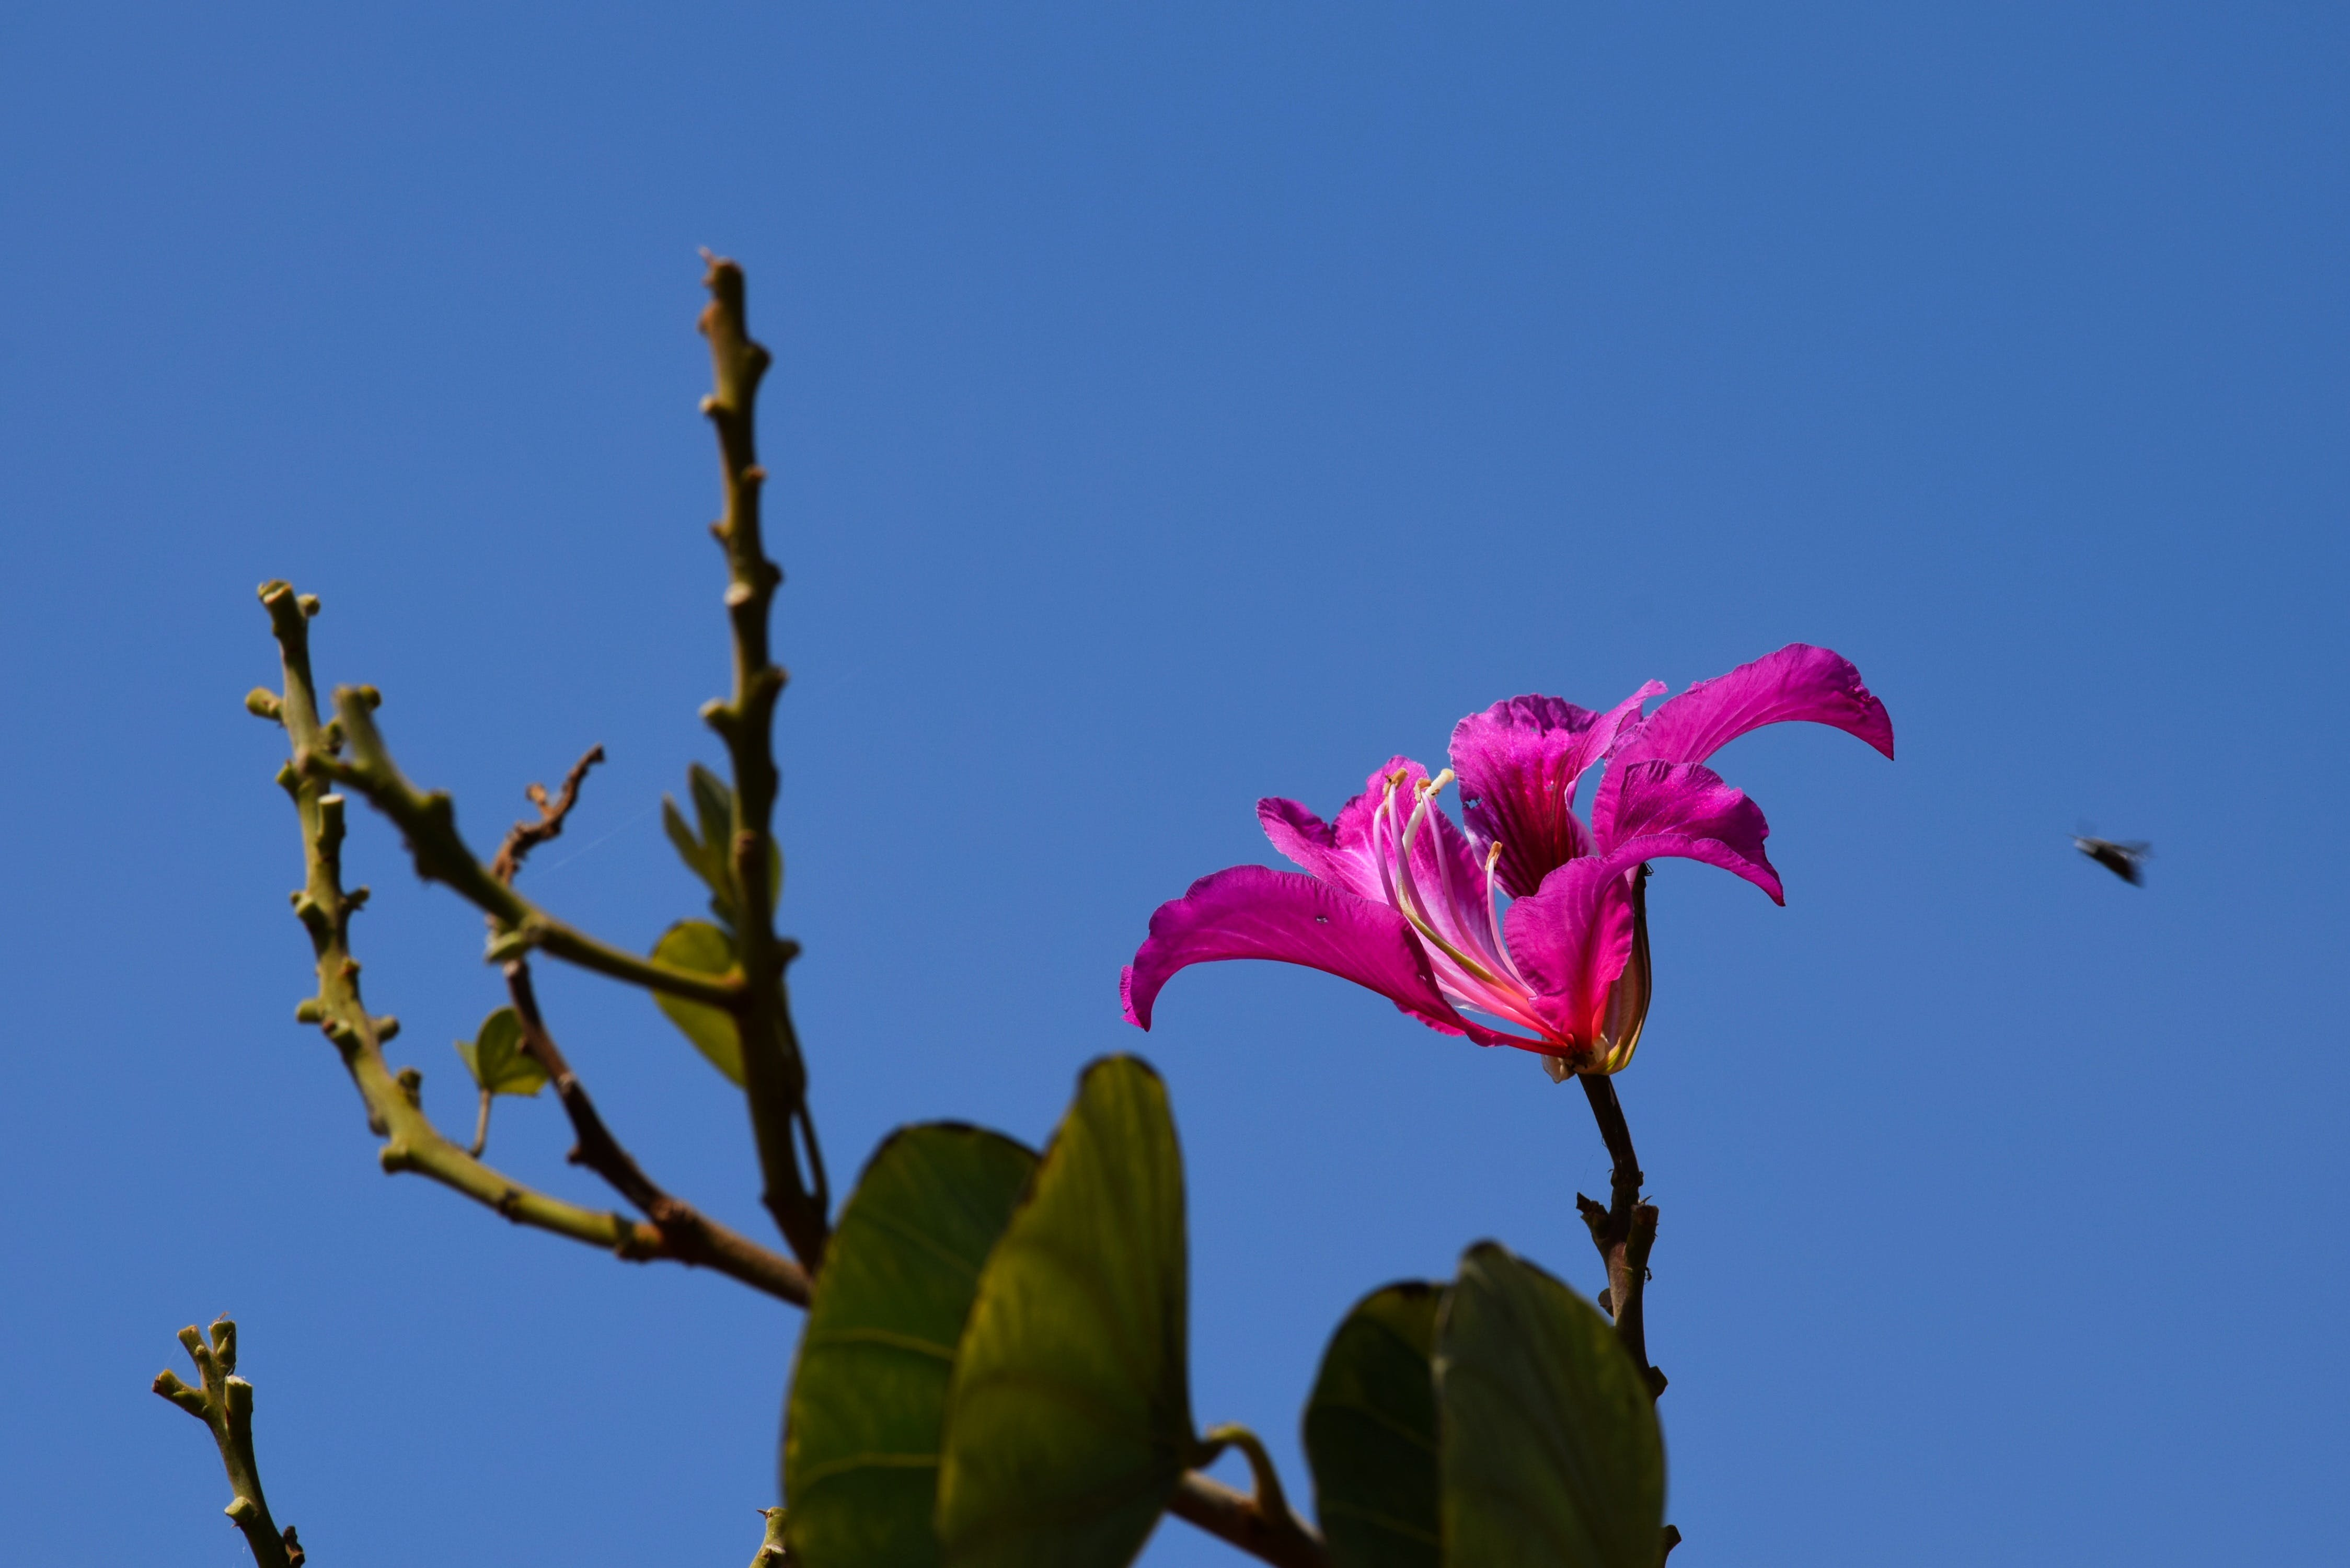 drosera, fiori bellissimi